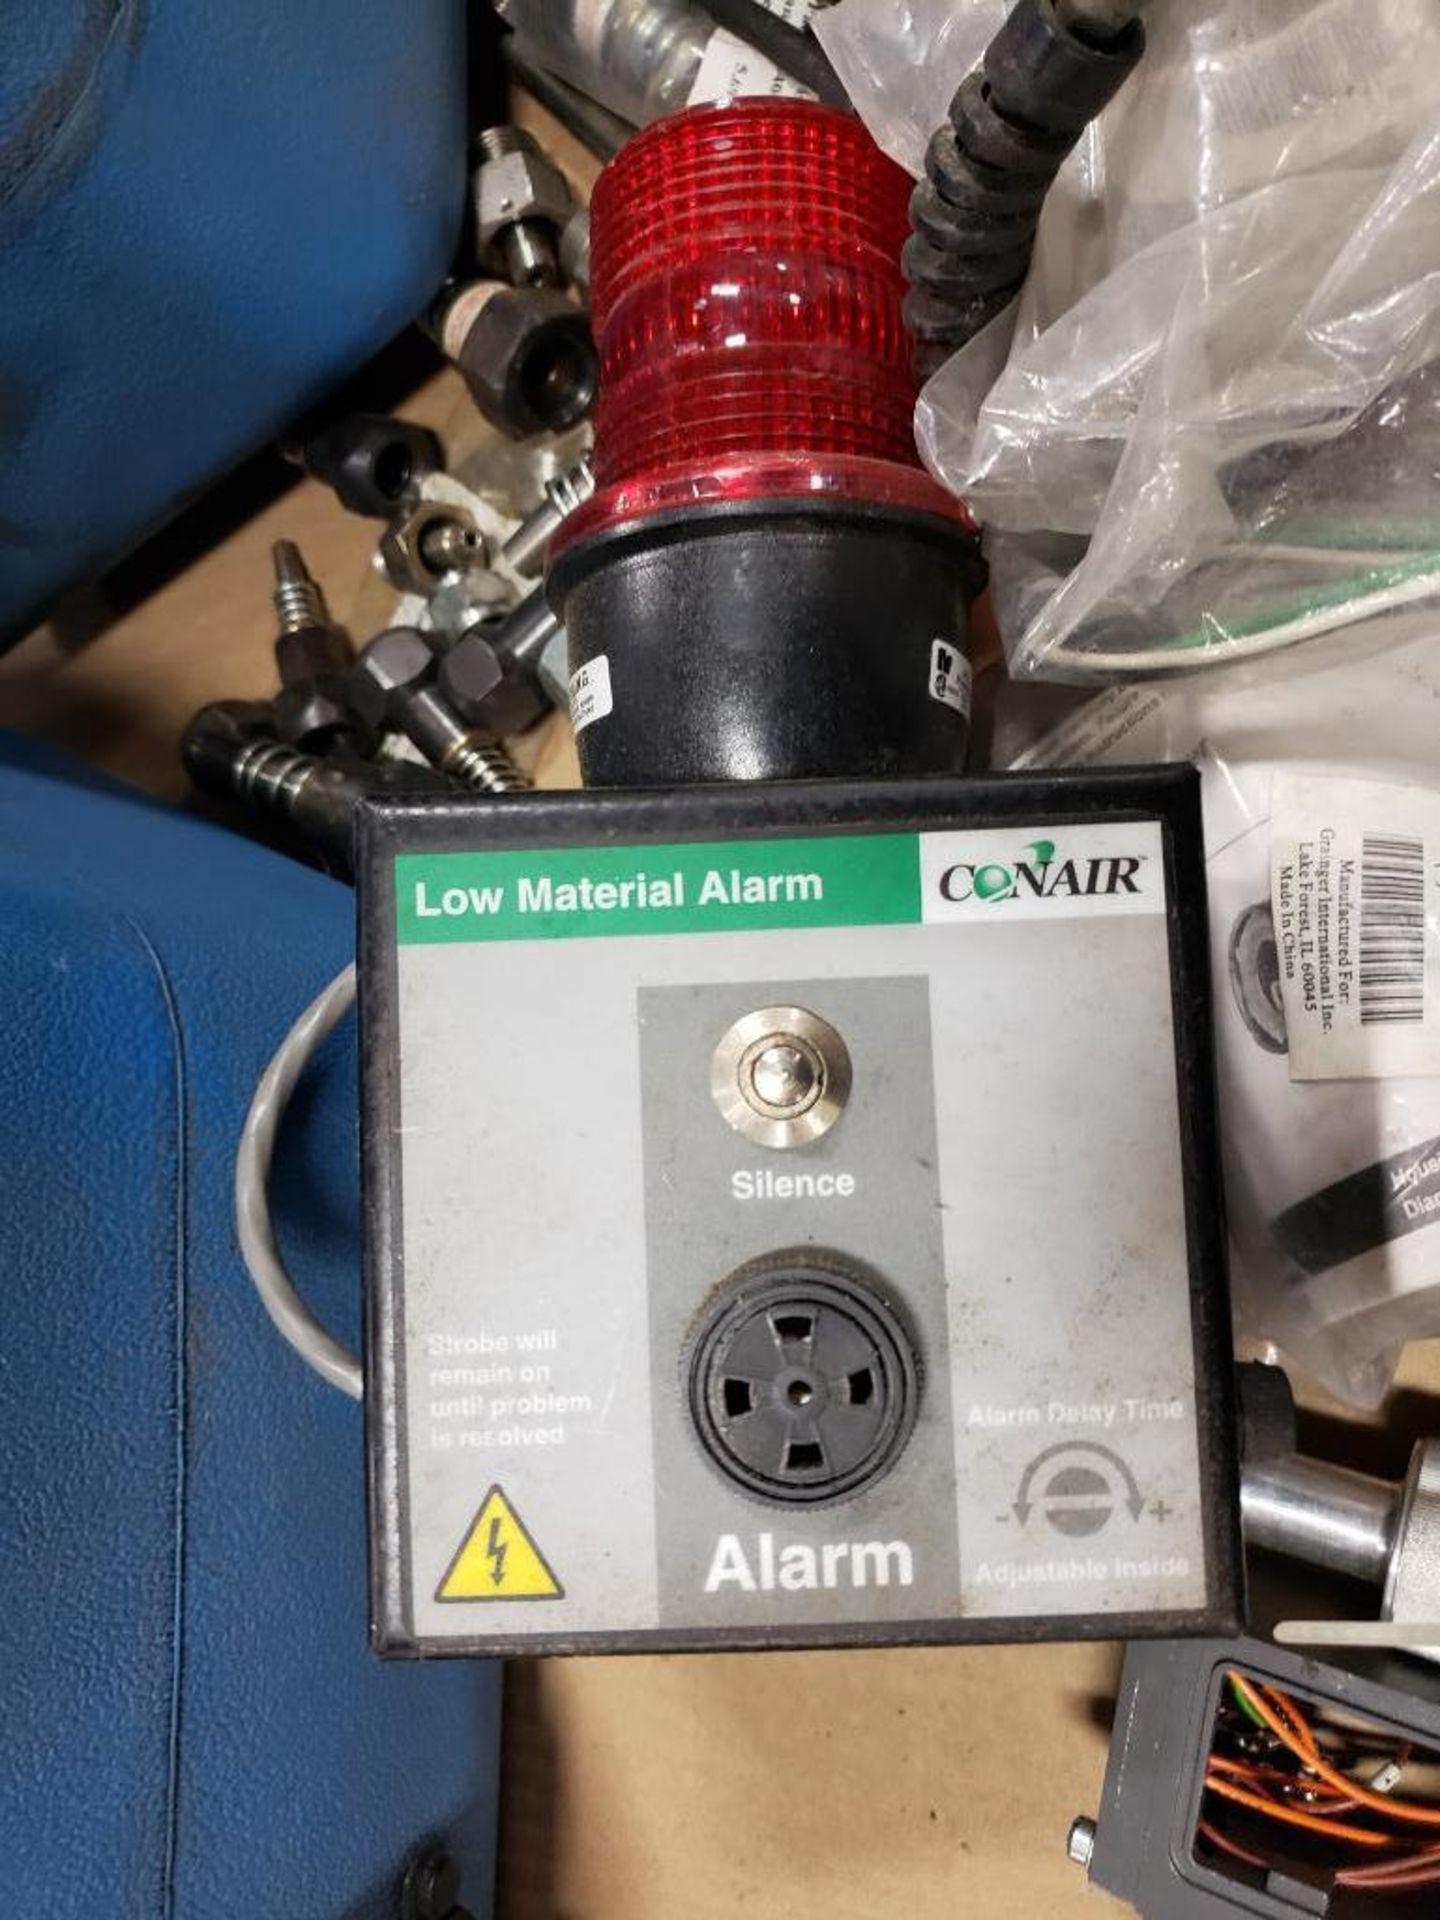 Pallet of assorted parts. Emergency eyewash, Conair universal terminal box, Hydraulik Ring valve. - Image 6 of 14